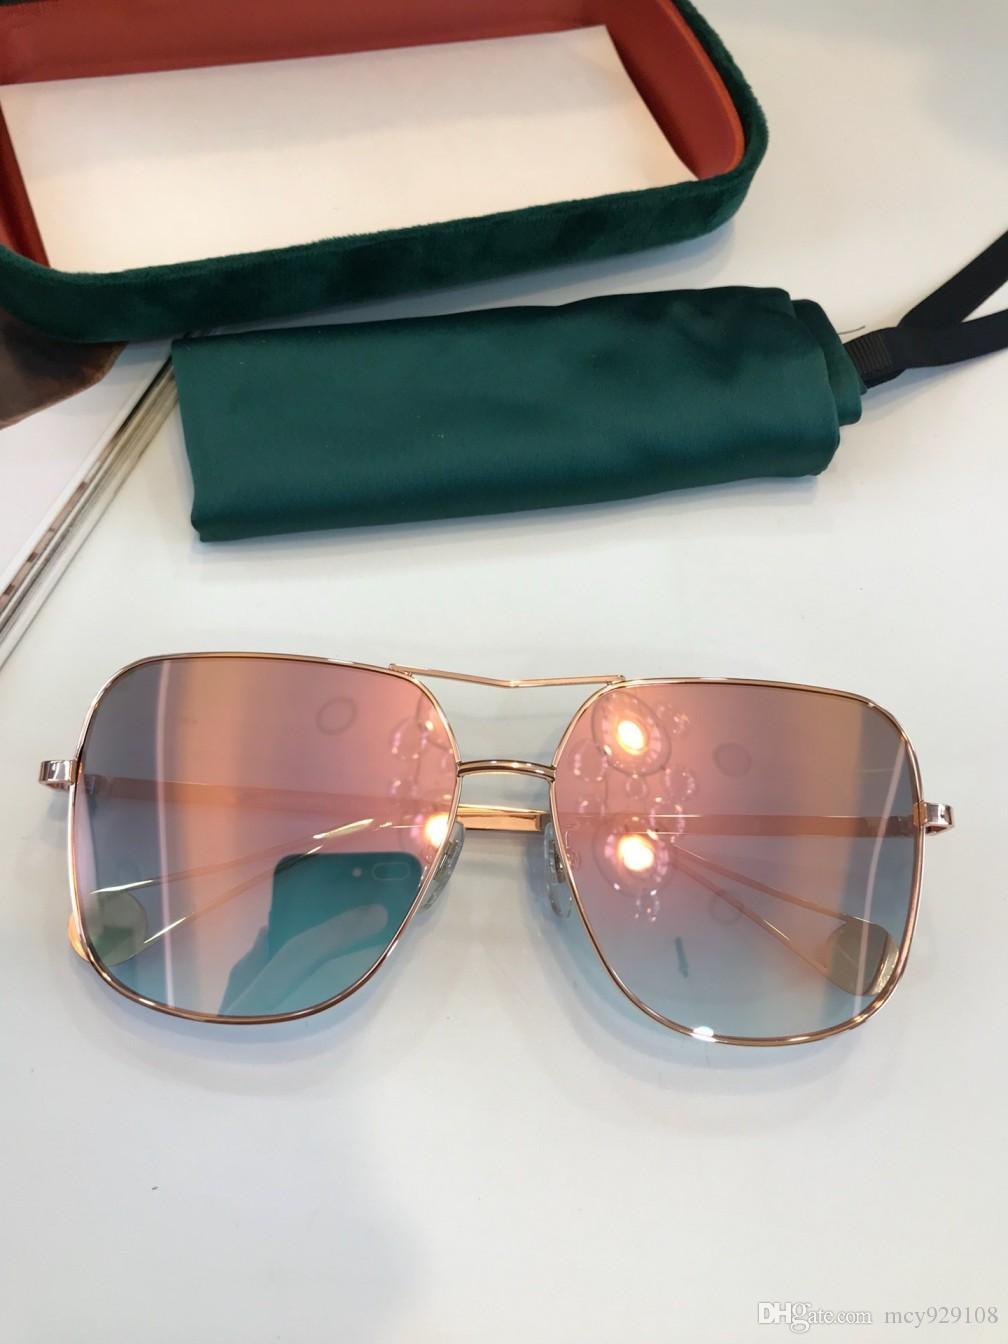 New fashion 0619 men sunglasses simple mens sunglasses popular women sunglasses outdoor summer protection uv400 wholesale eyewear with case